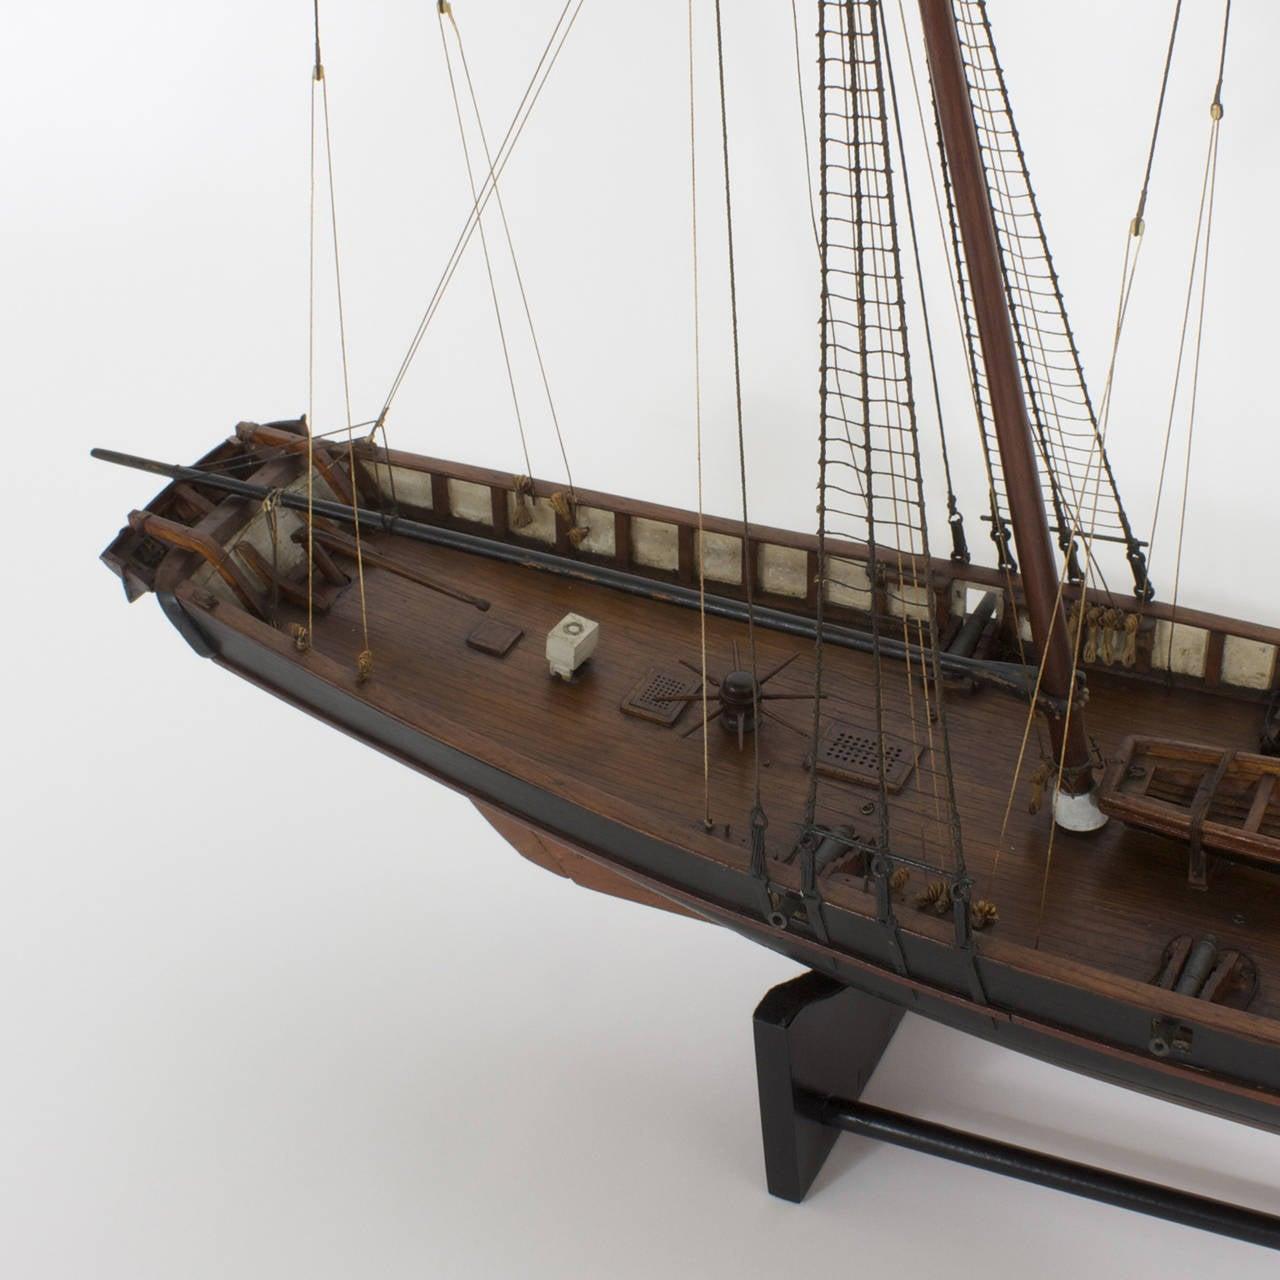 19th Century Mahogany Schooner Ship or Boat Model For Sale